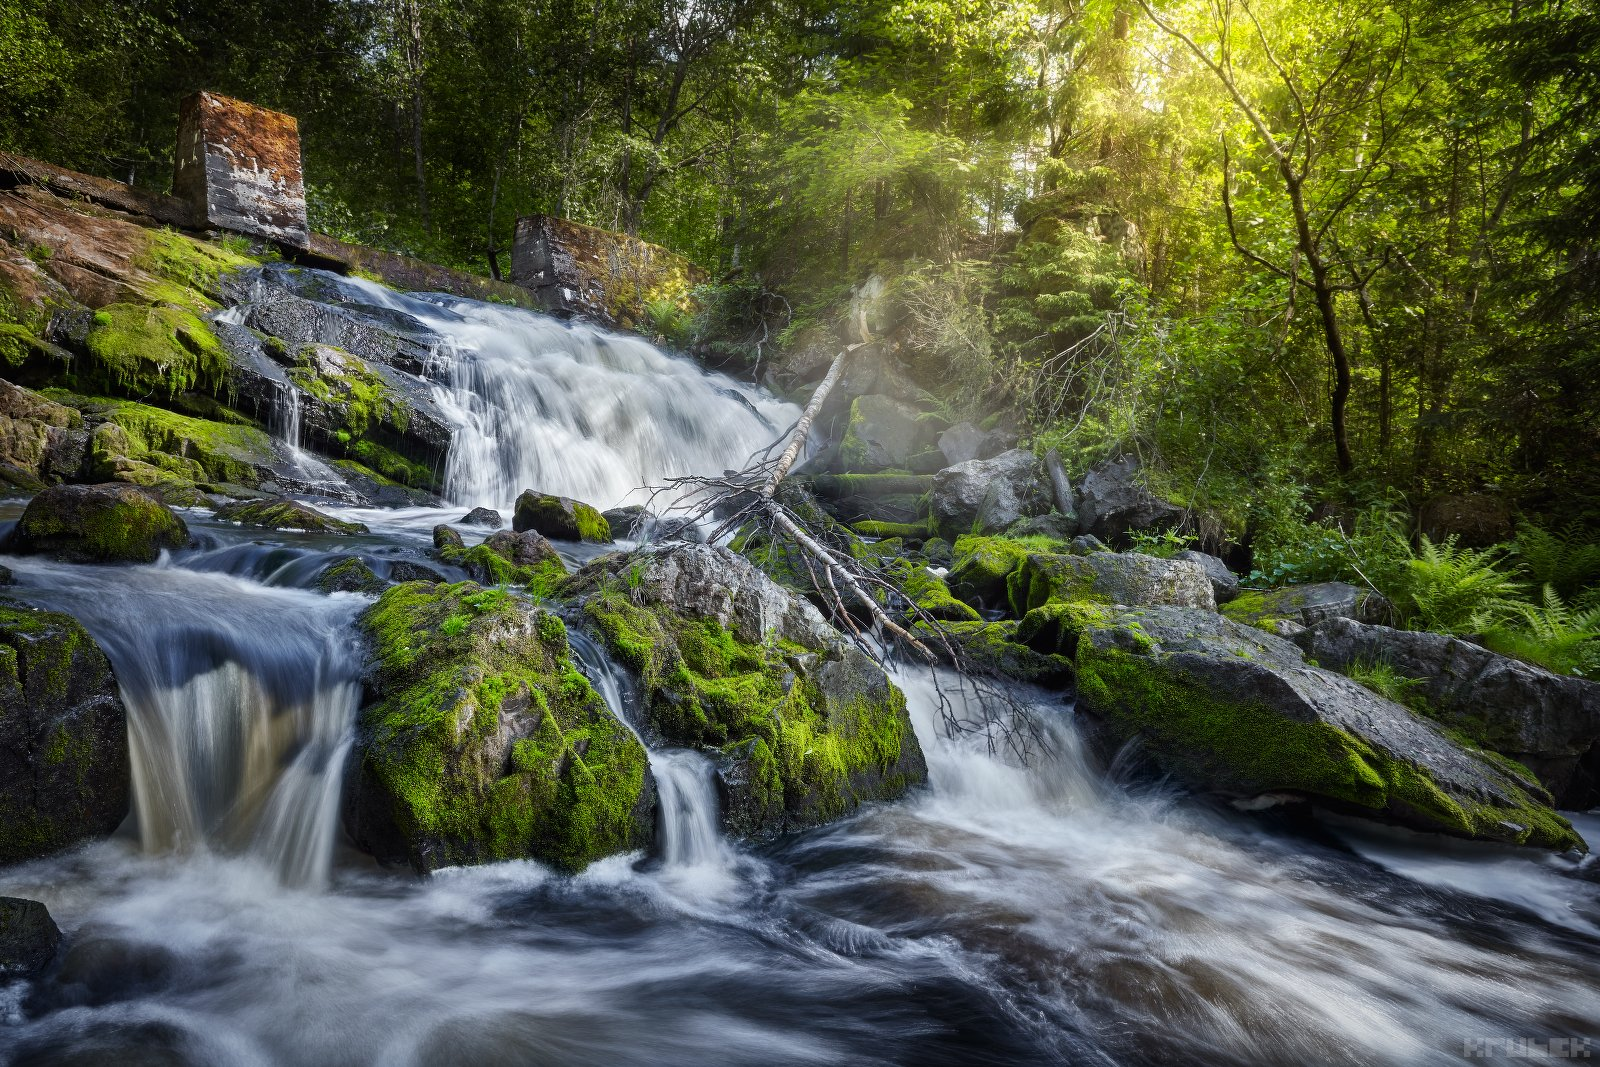 карелия, водопад, пейзаж, природа, север, KrubeK